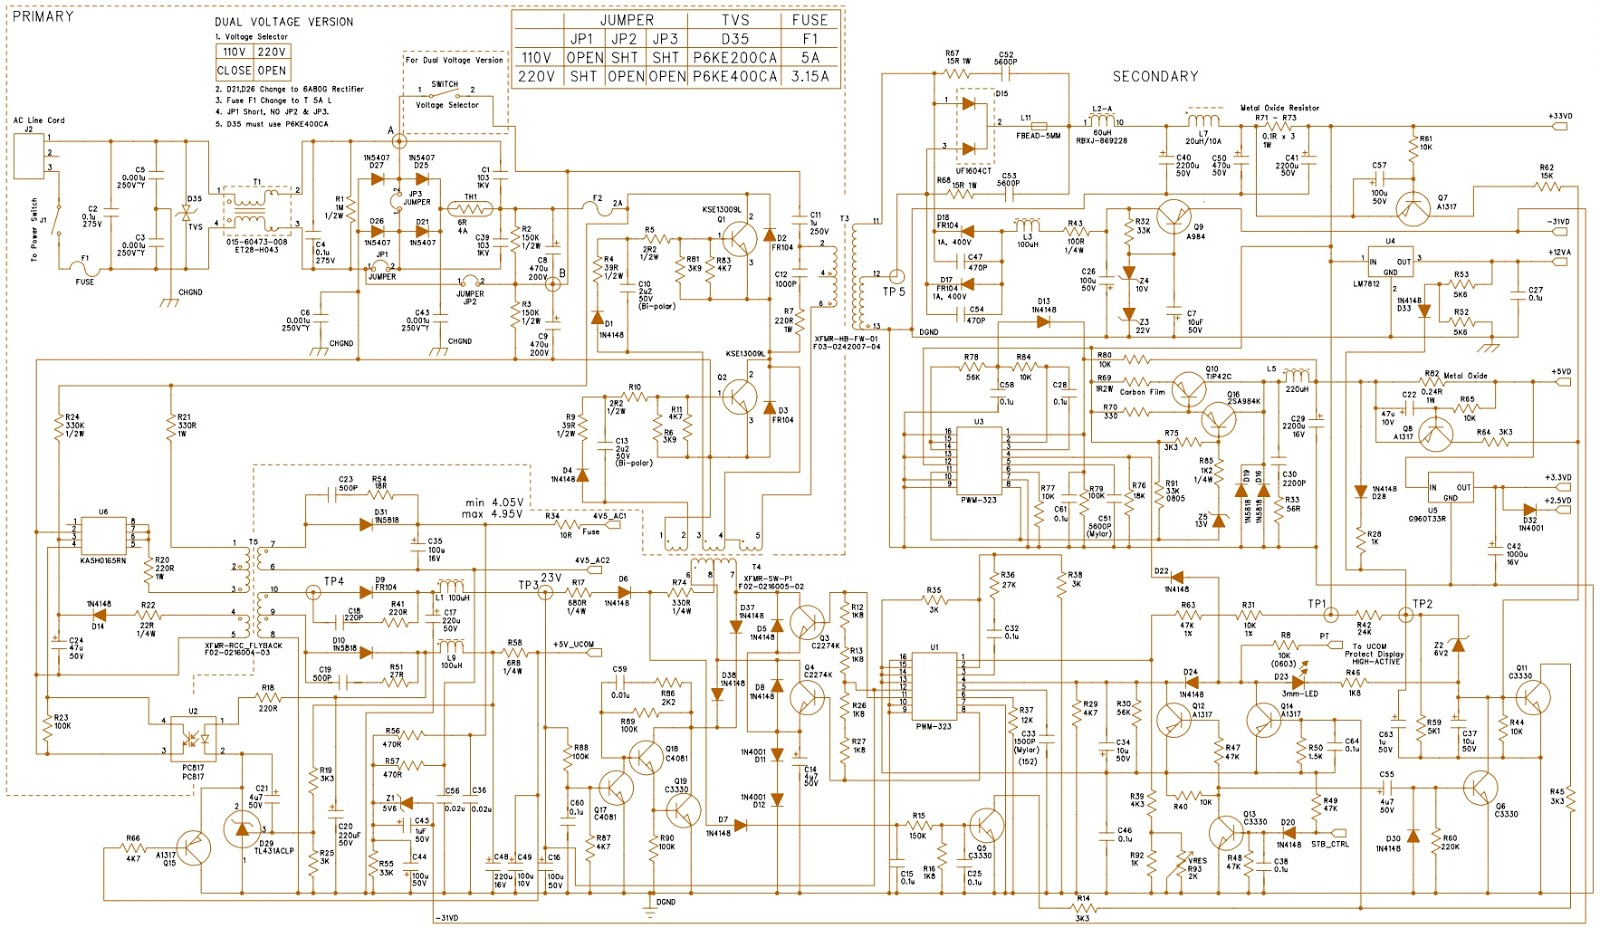 1987 buick grand national fuse box diagram buick grand 1987 buick grand national radio [ 1600 x 928 Pixel ]